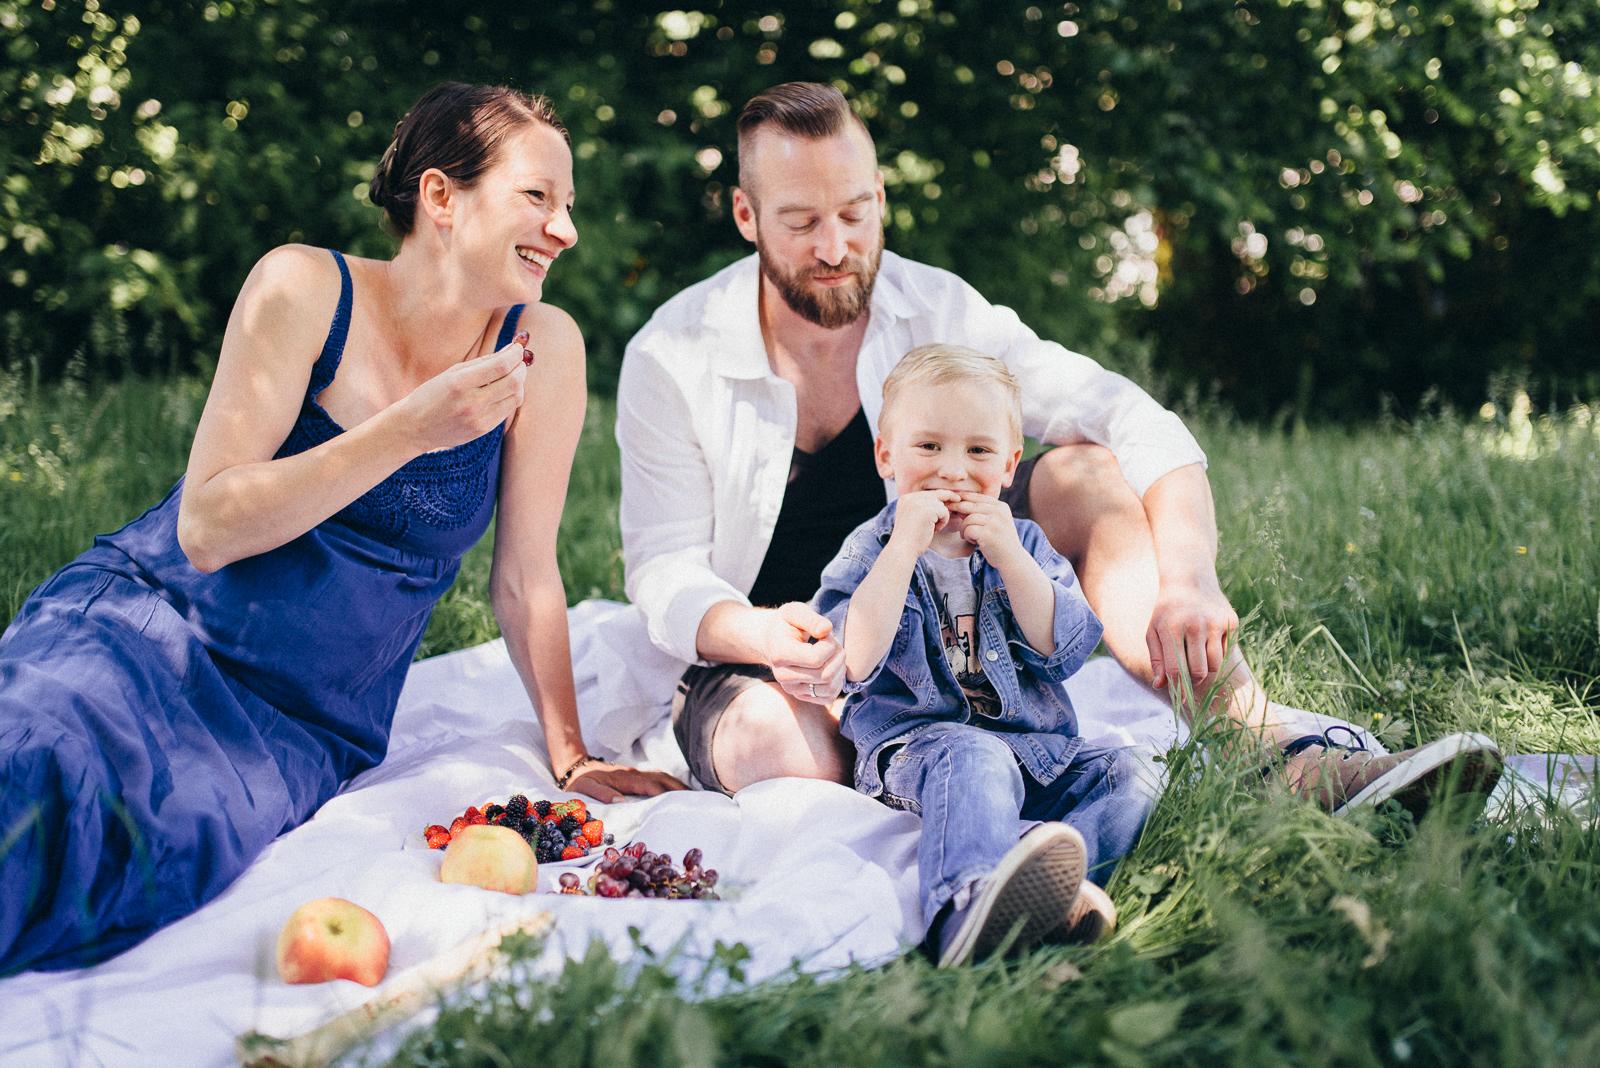 003-designparaplus-familie-fotografie-essen-familienshooting